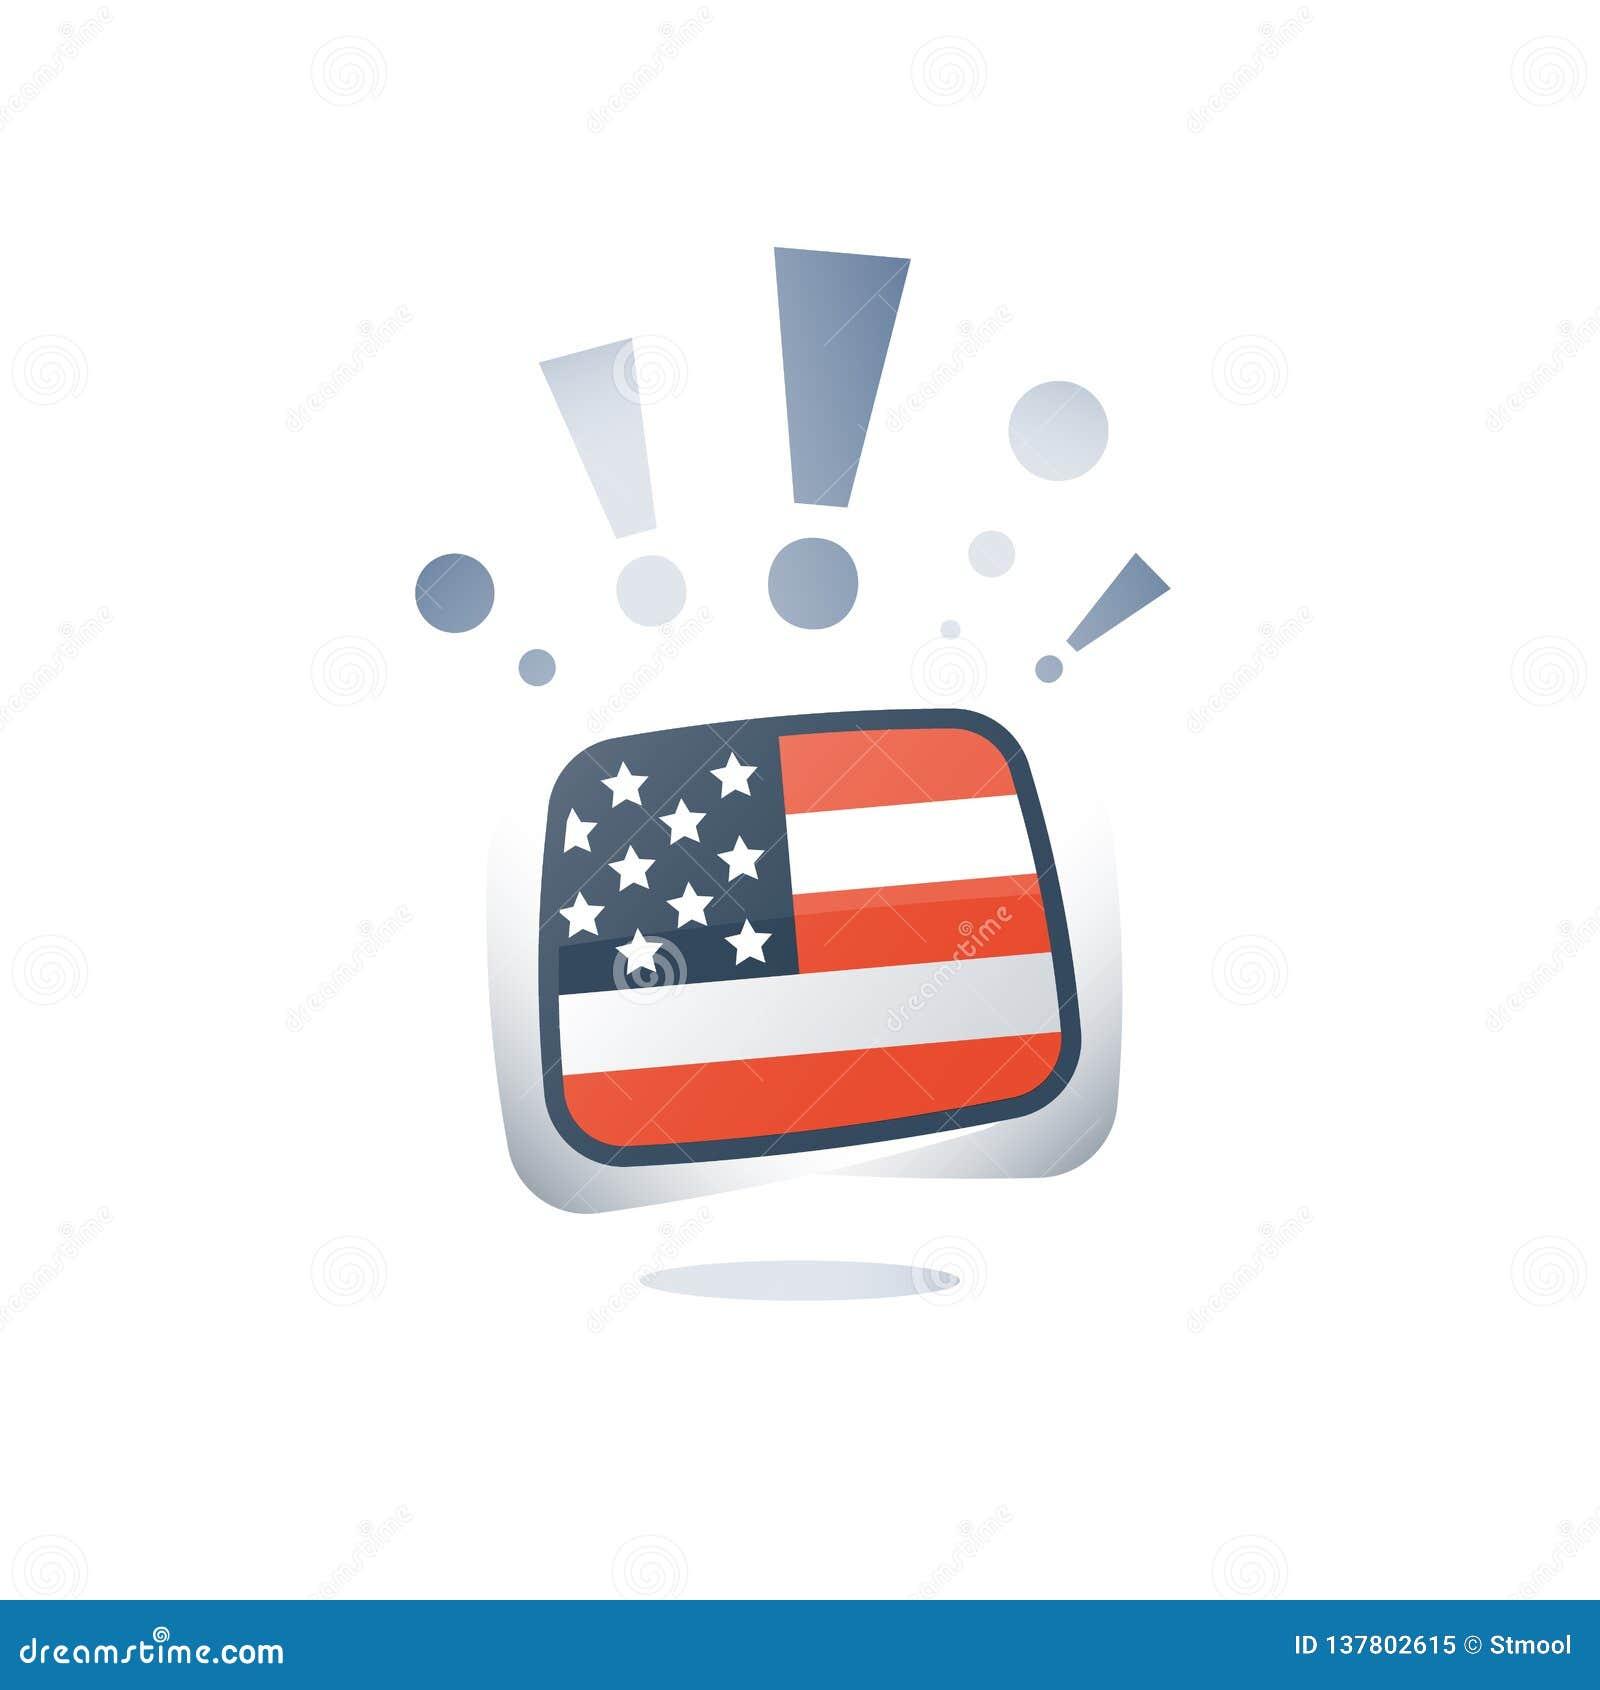 USA flag, American English language, linguistic learning, online course, preparation program, vocabulary improvement